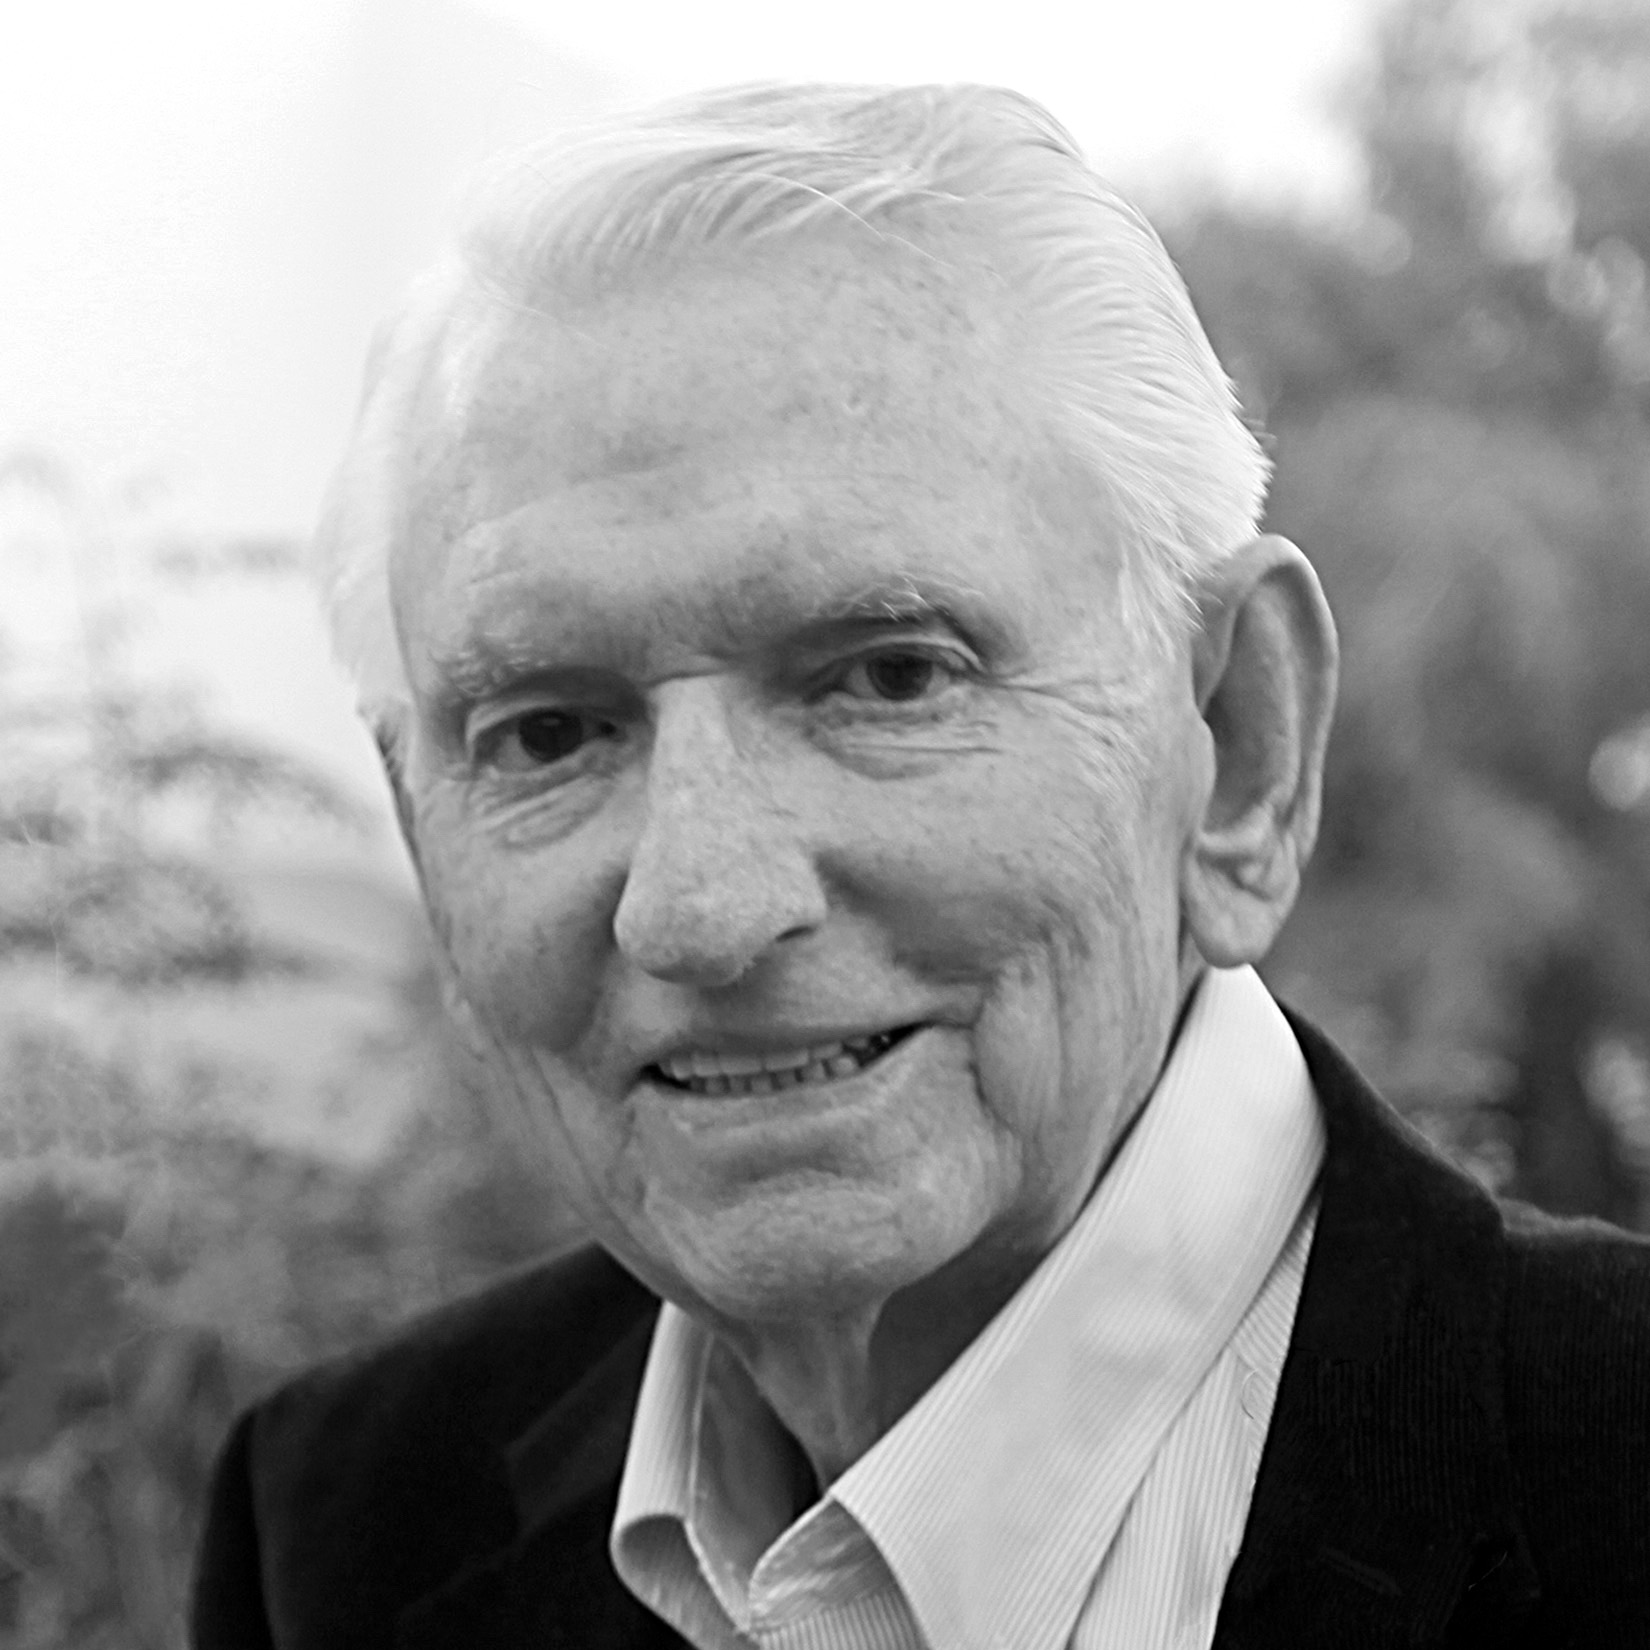 George Norris Smith